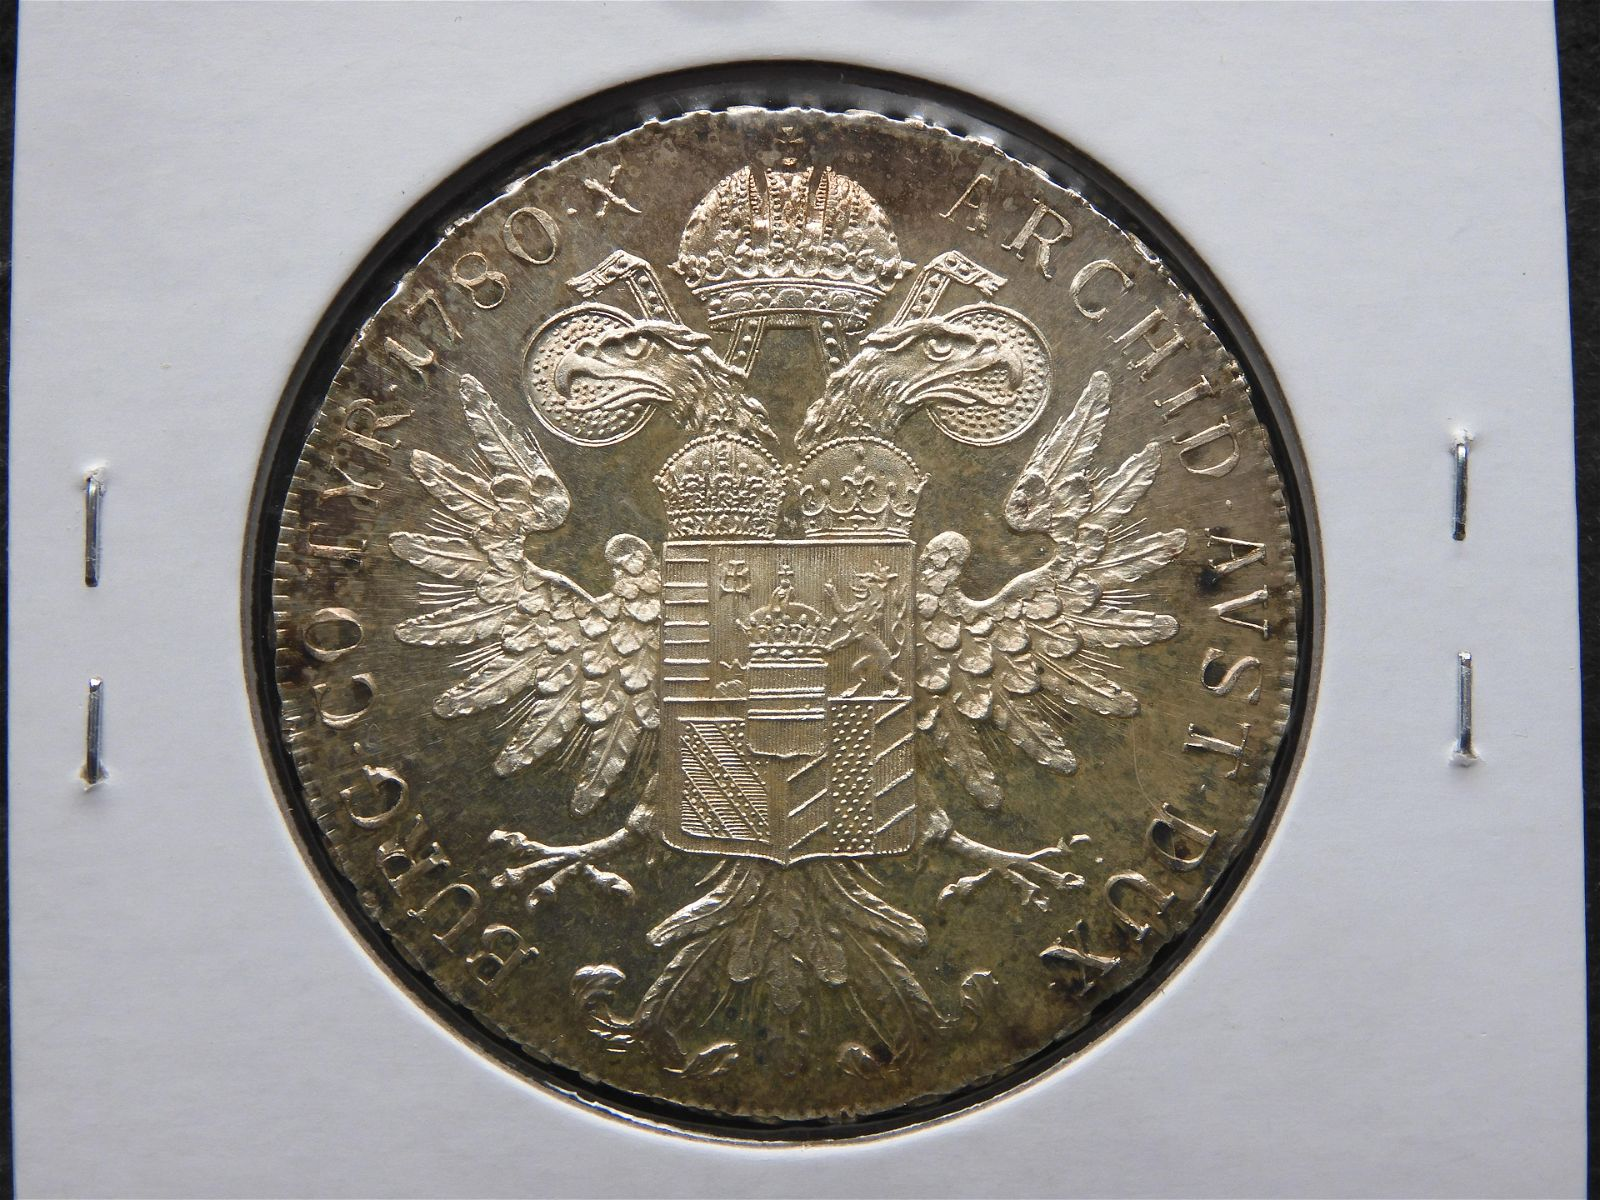 1780 Austria Maria Theresa Thaler. Silver. Restrike.